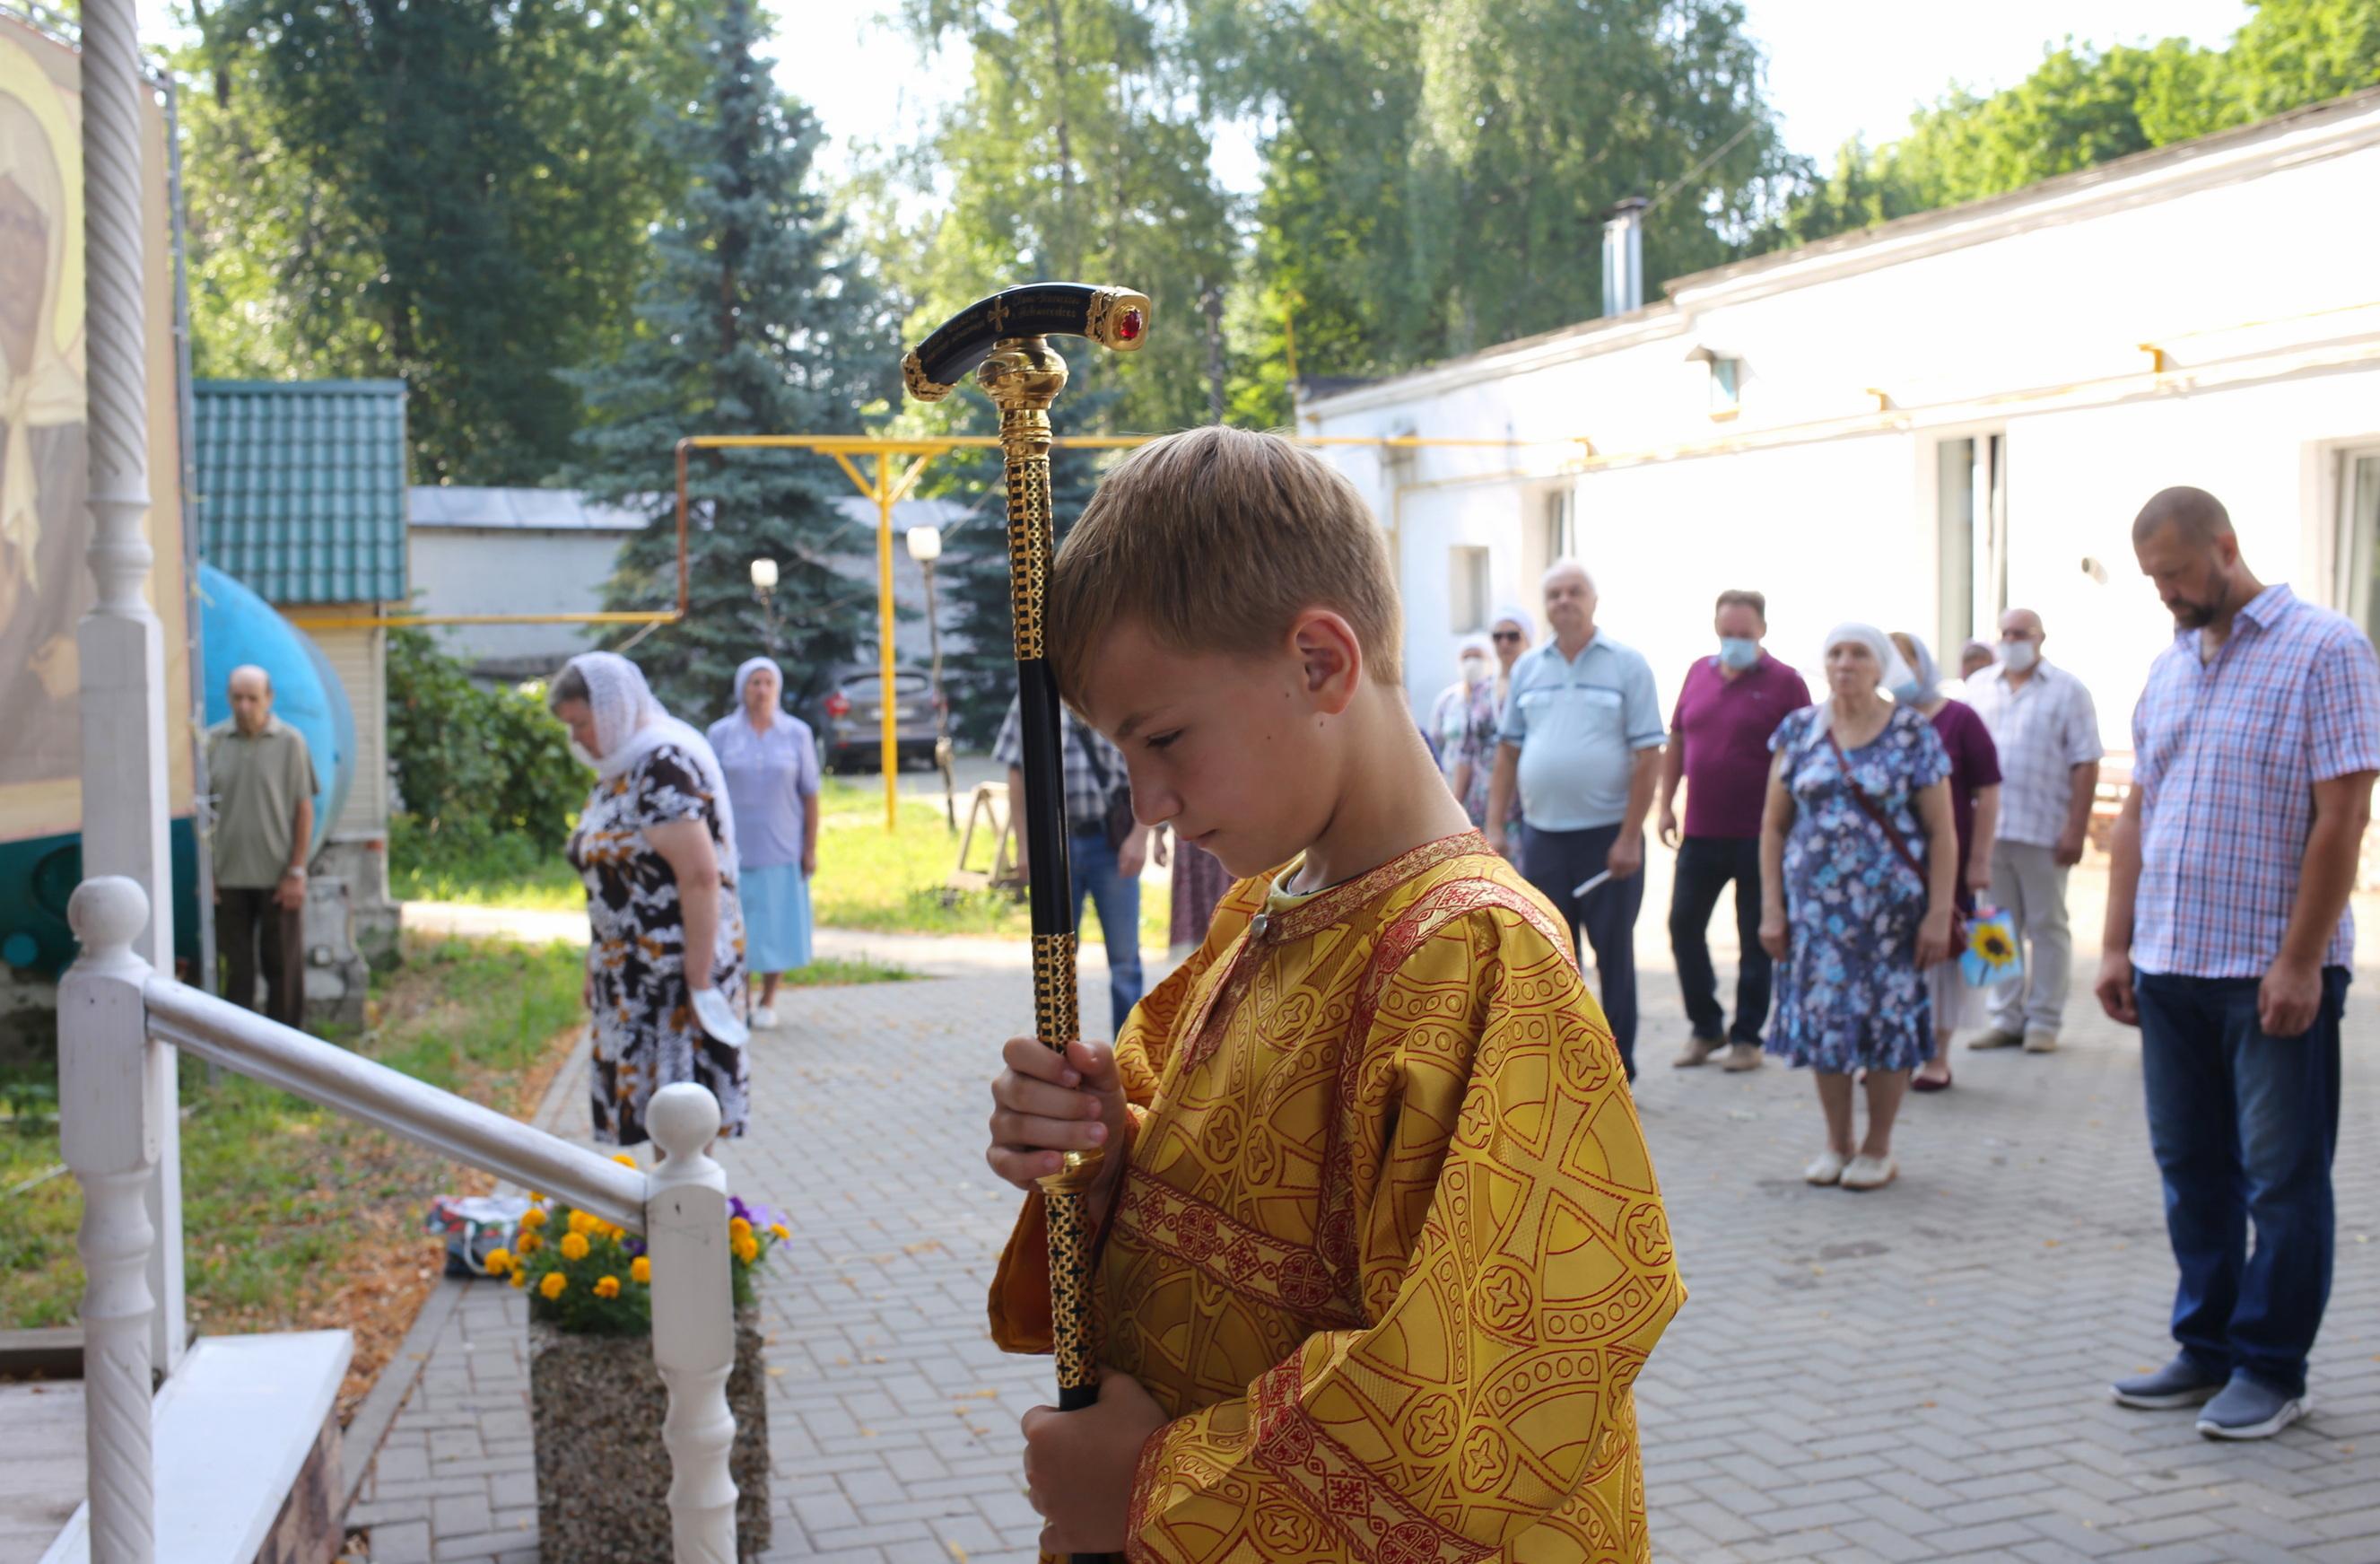 http://monuspen.ru/photoreports/0b6ade44eec28ab7deaa46b13ae6733j.JPG